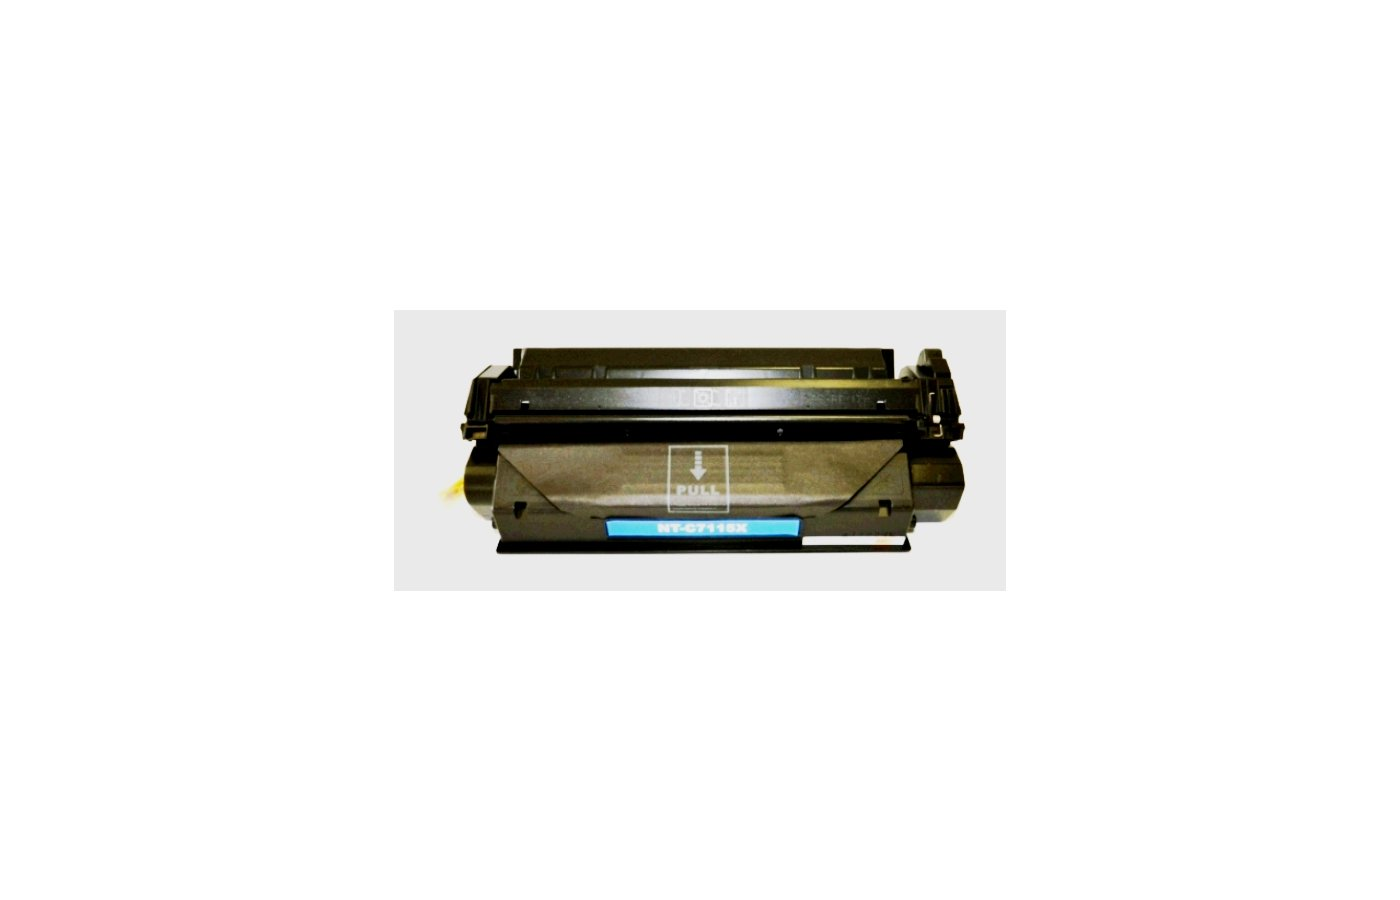 Картридж лазерный GG NT-C7115X Совместимый для HP LaserJet 1000/1005/1200/3300/3320/3330 Canon LBP-1210 (3500стр)